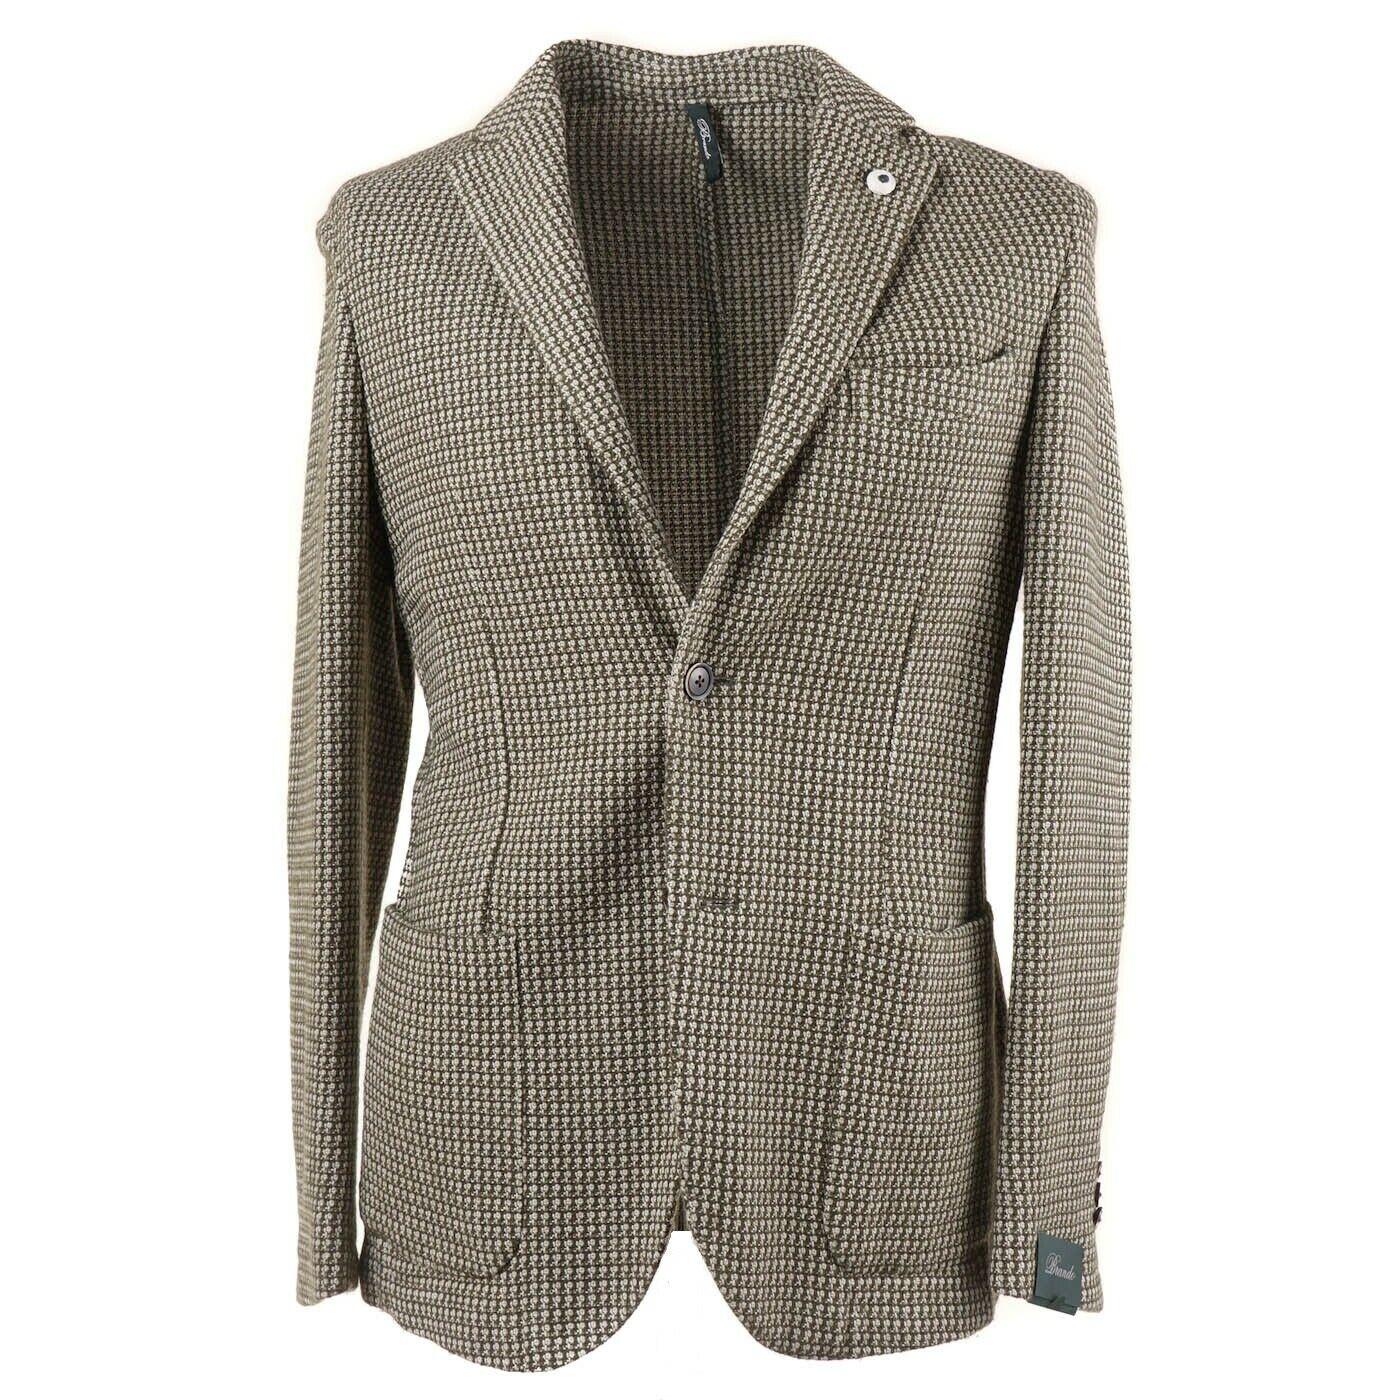 NWT  BRANDO (L.B.M. 1911) Green Knit Wool and Cotton Sport Coat 38 R